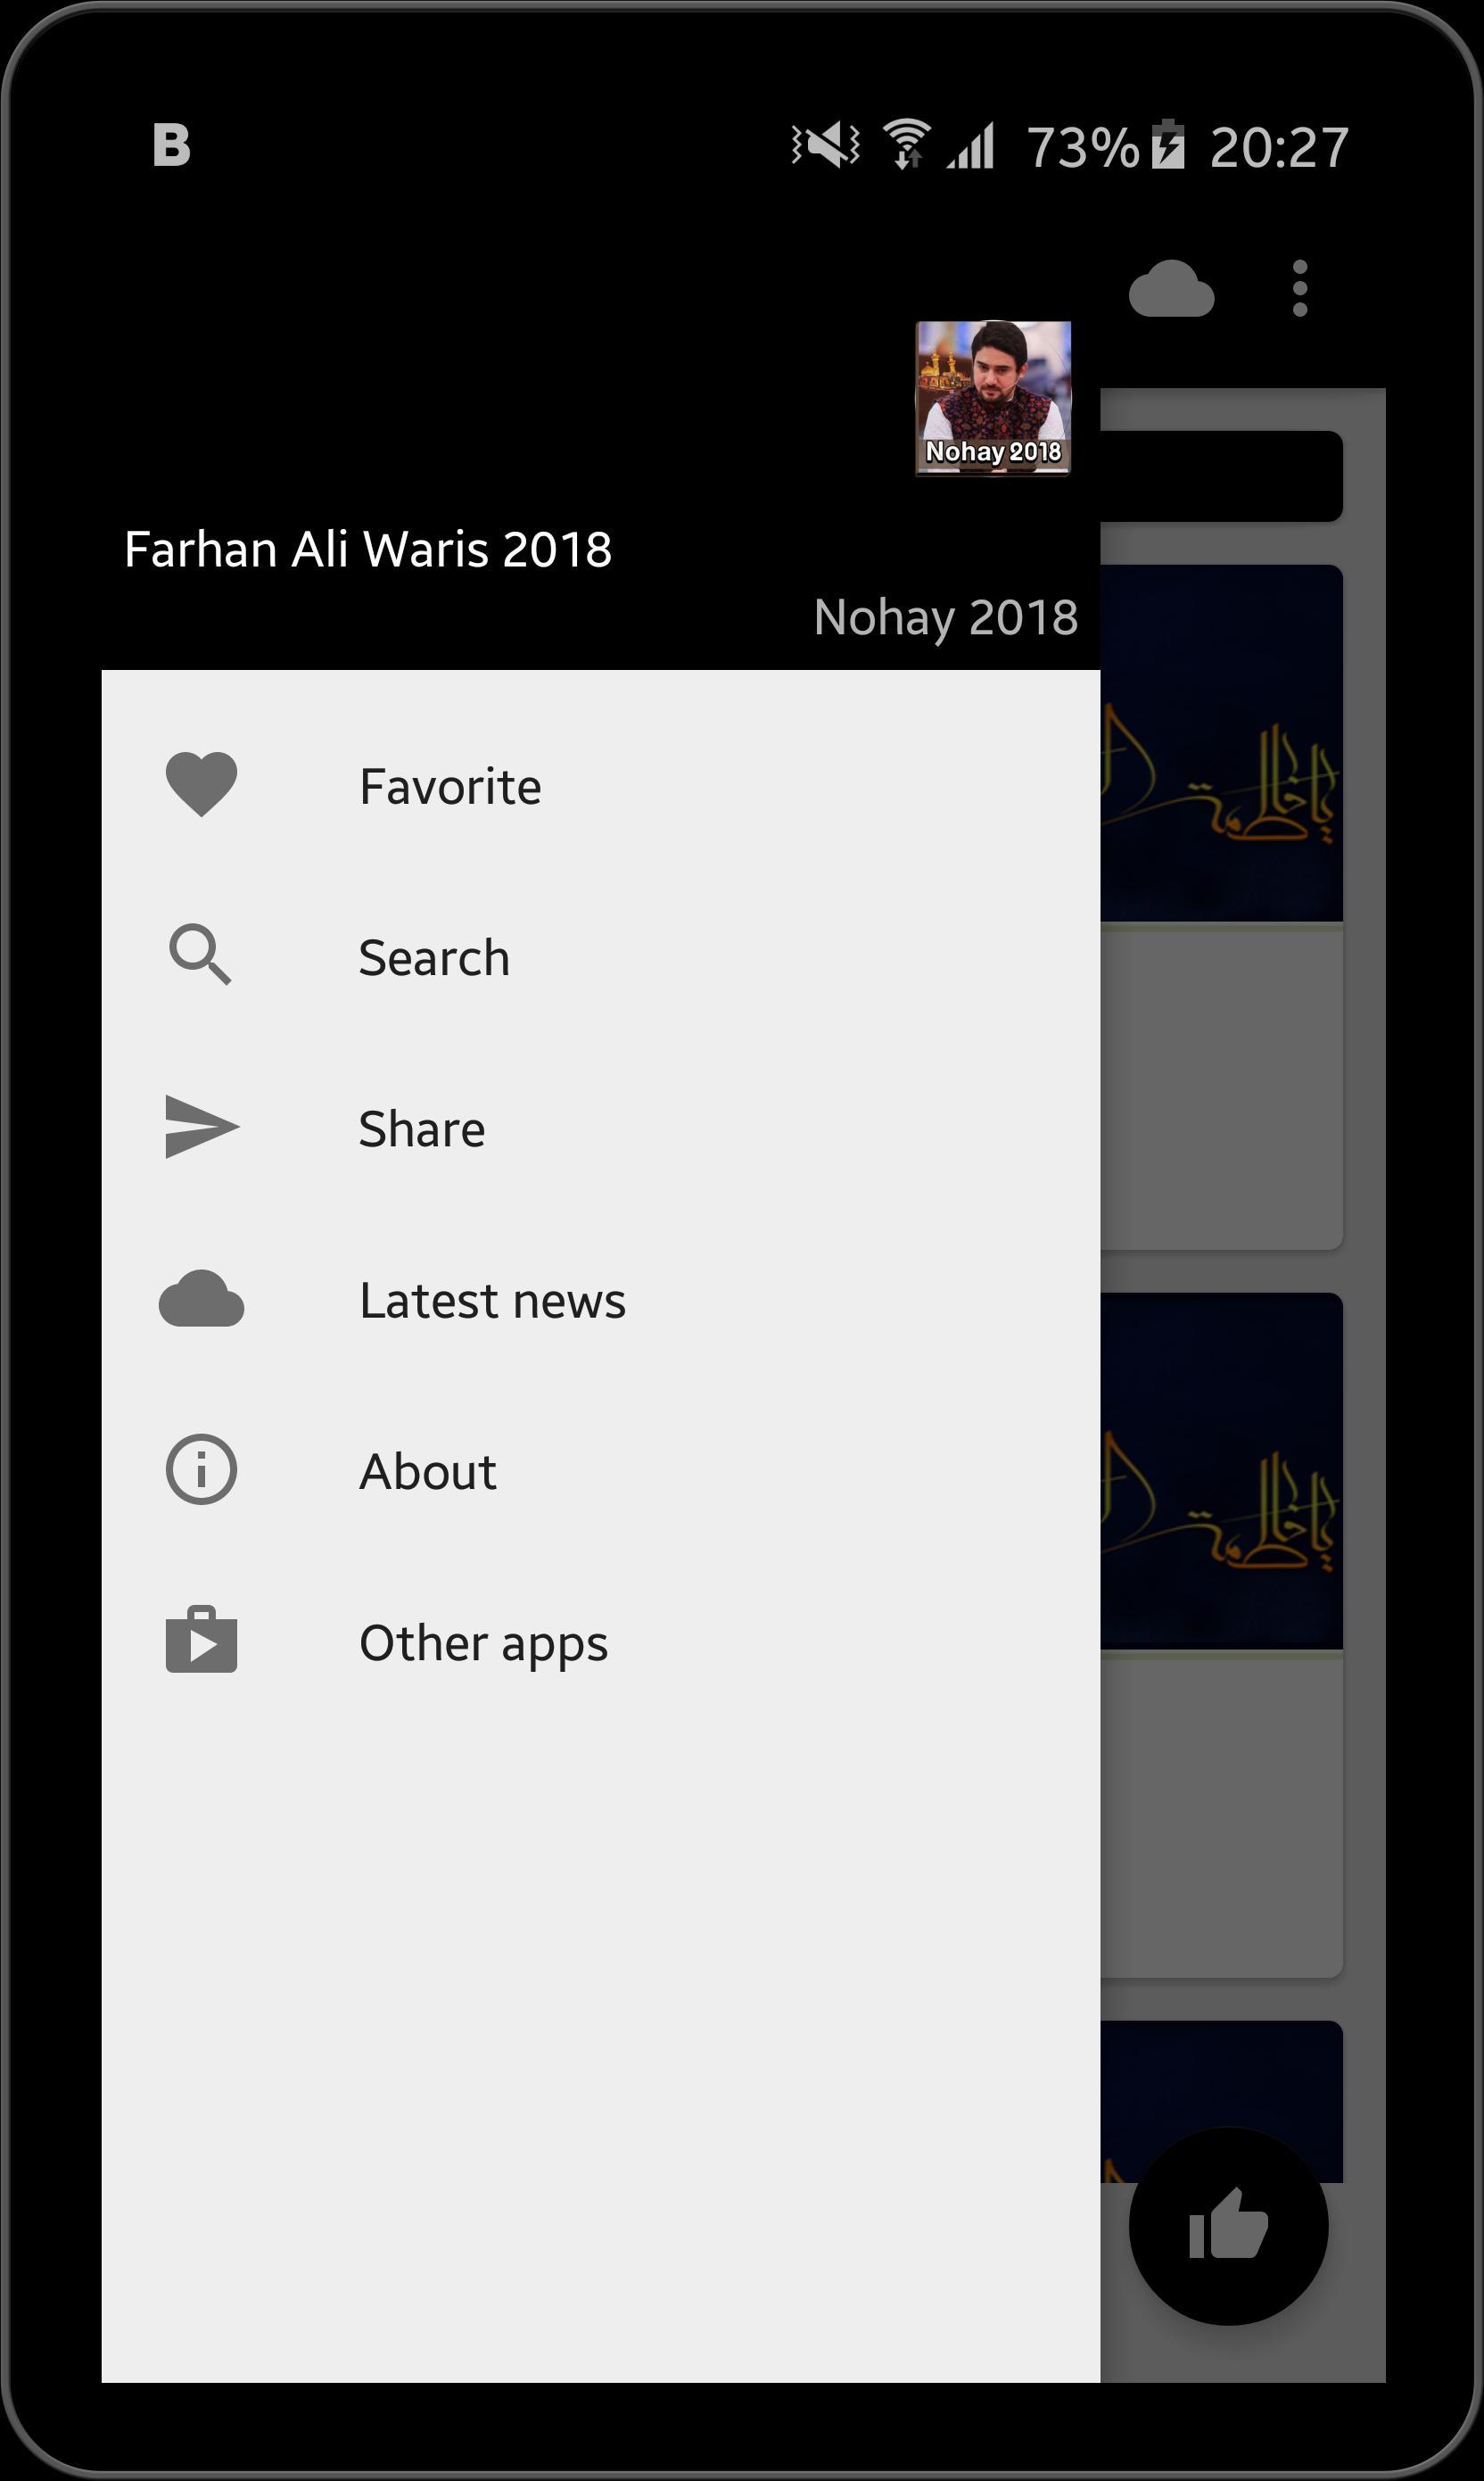 Farhan Ali Waris nohay 2018 for Android - APK Download